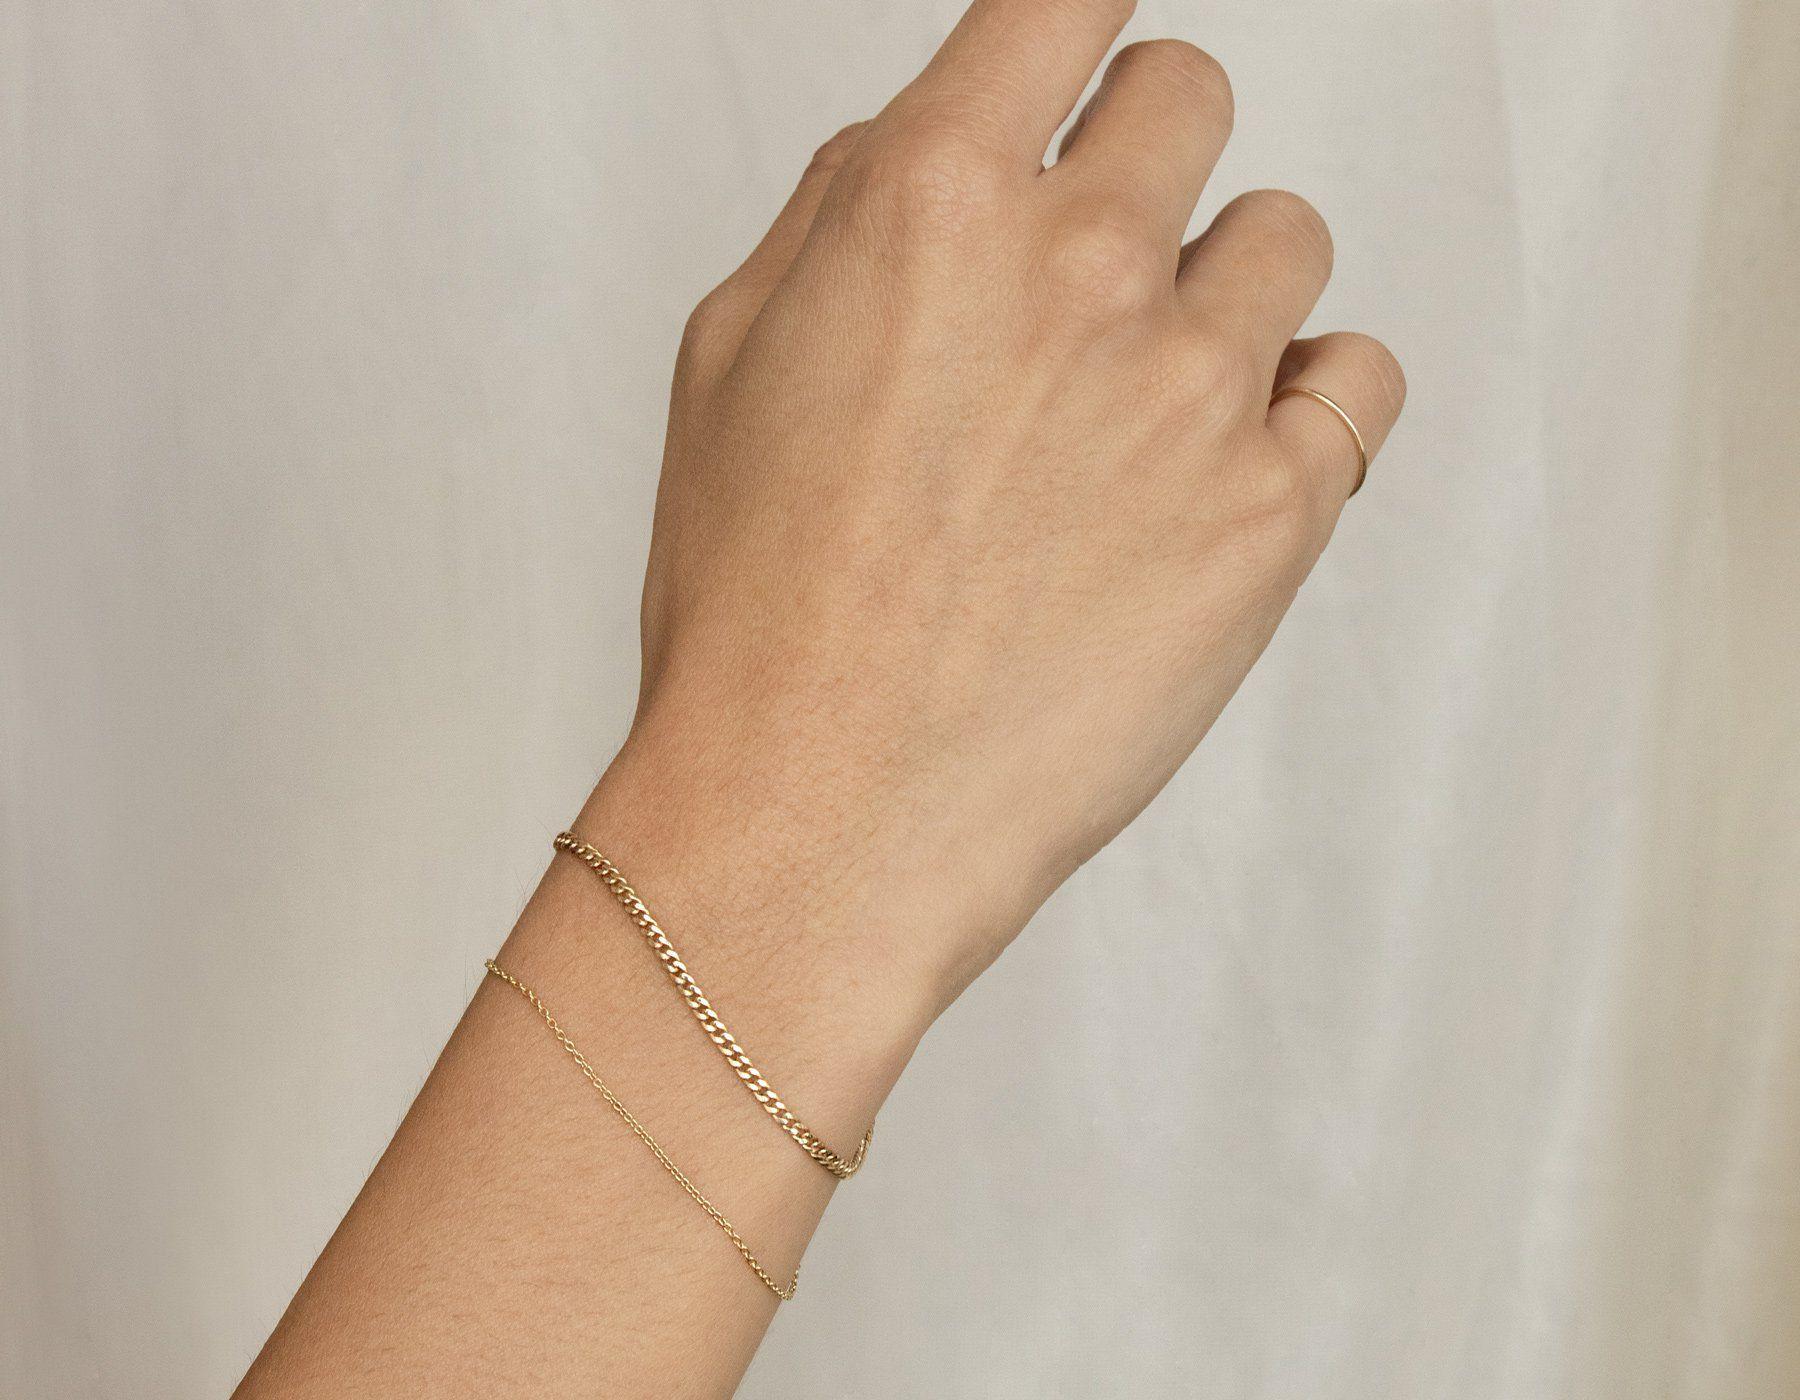 6mm Tiny Heart Bracelet Beautiful Heart Bracelet Plain Heart Bracelet Minimlist Bracelet 14K Gold Bracelet Love Heart Chain Bracelet